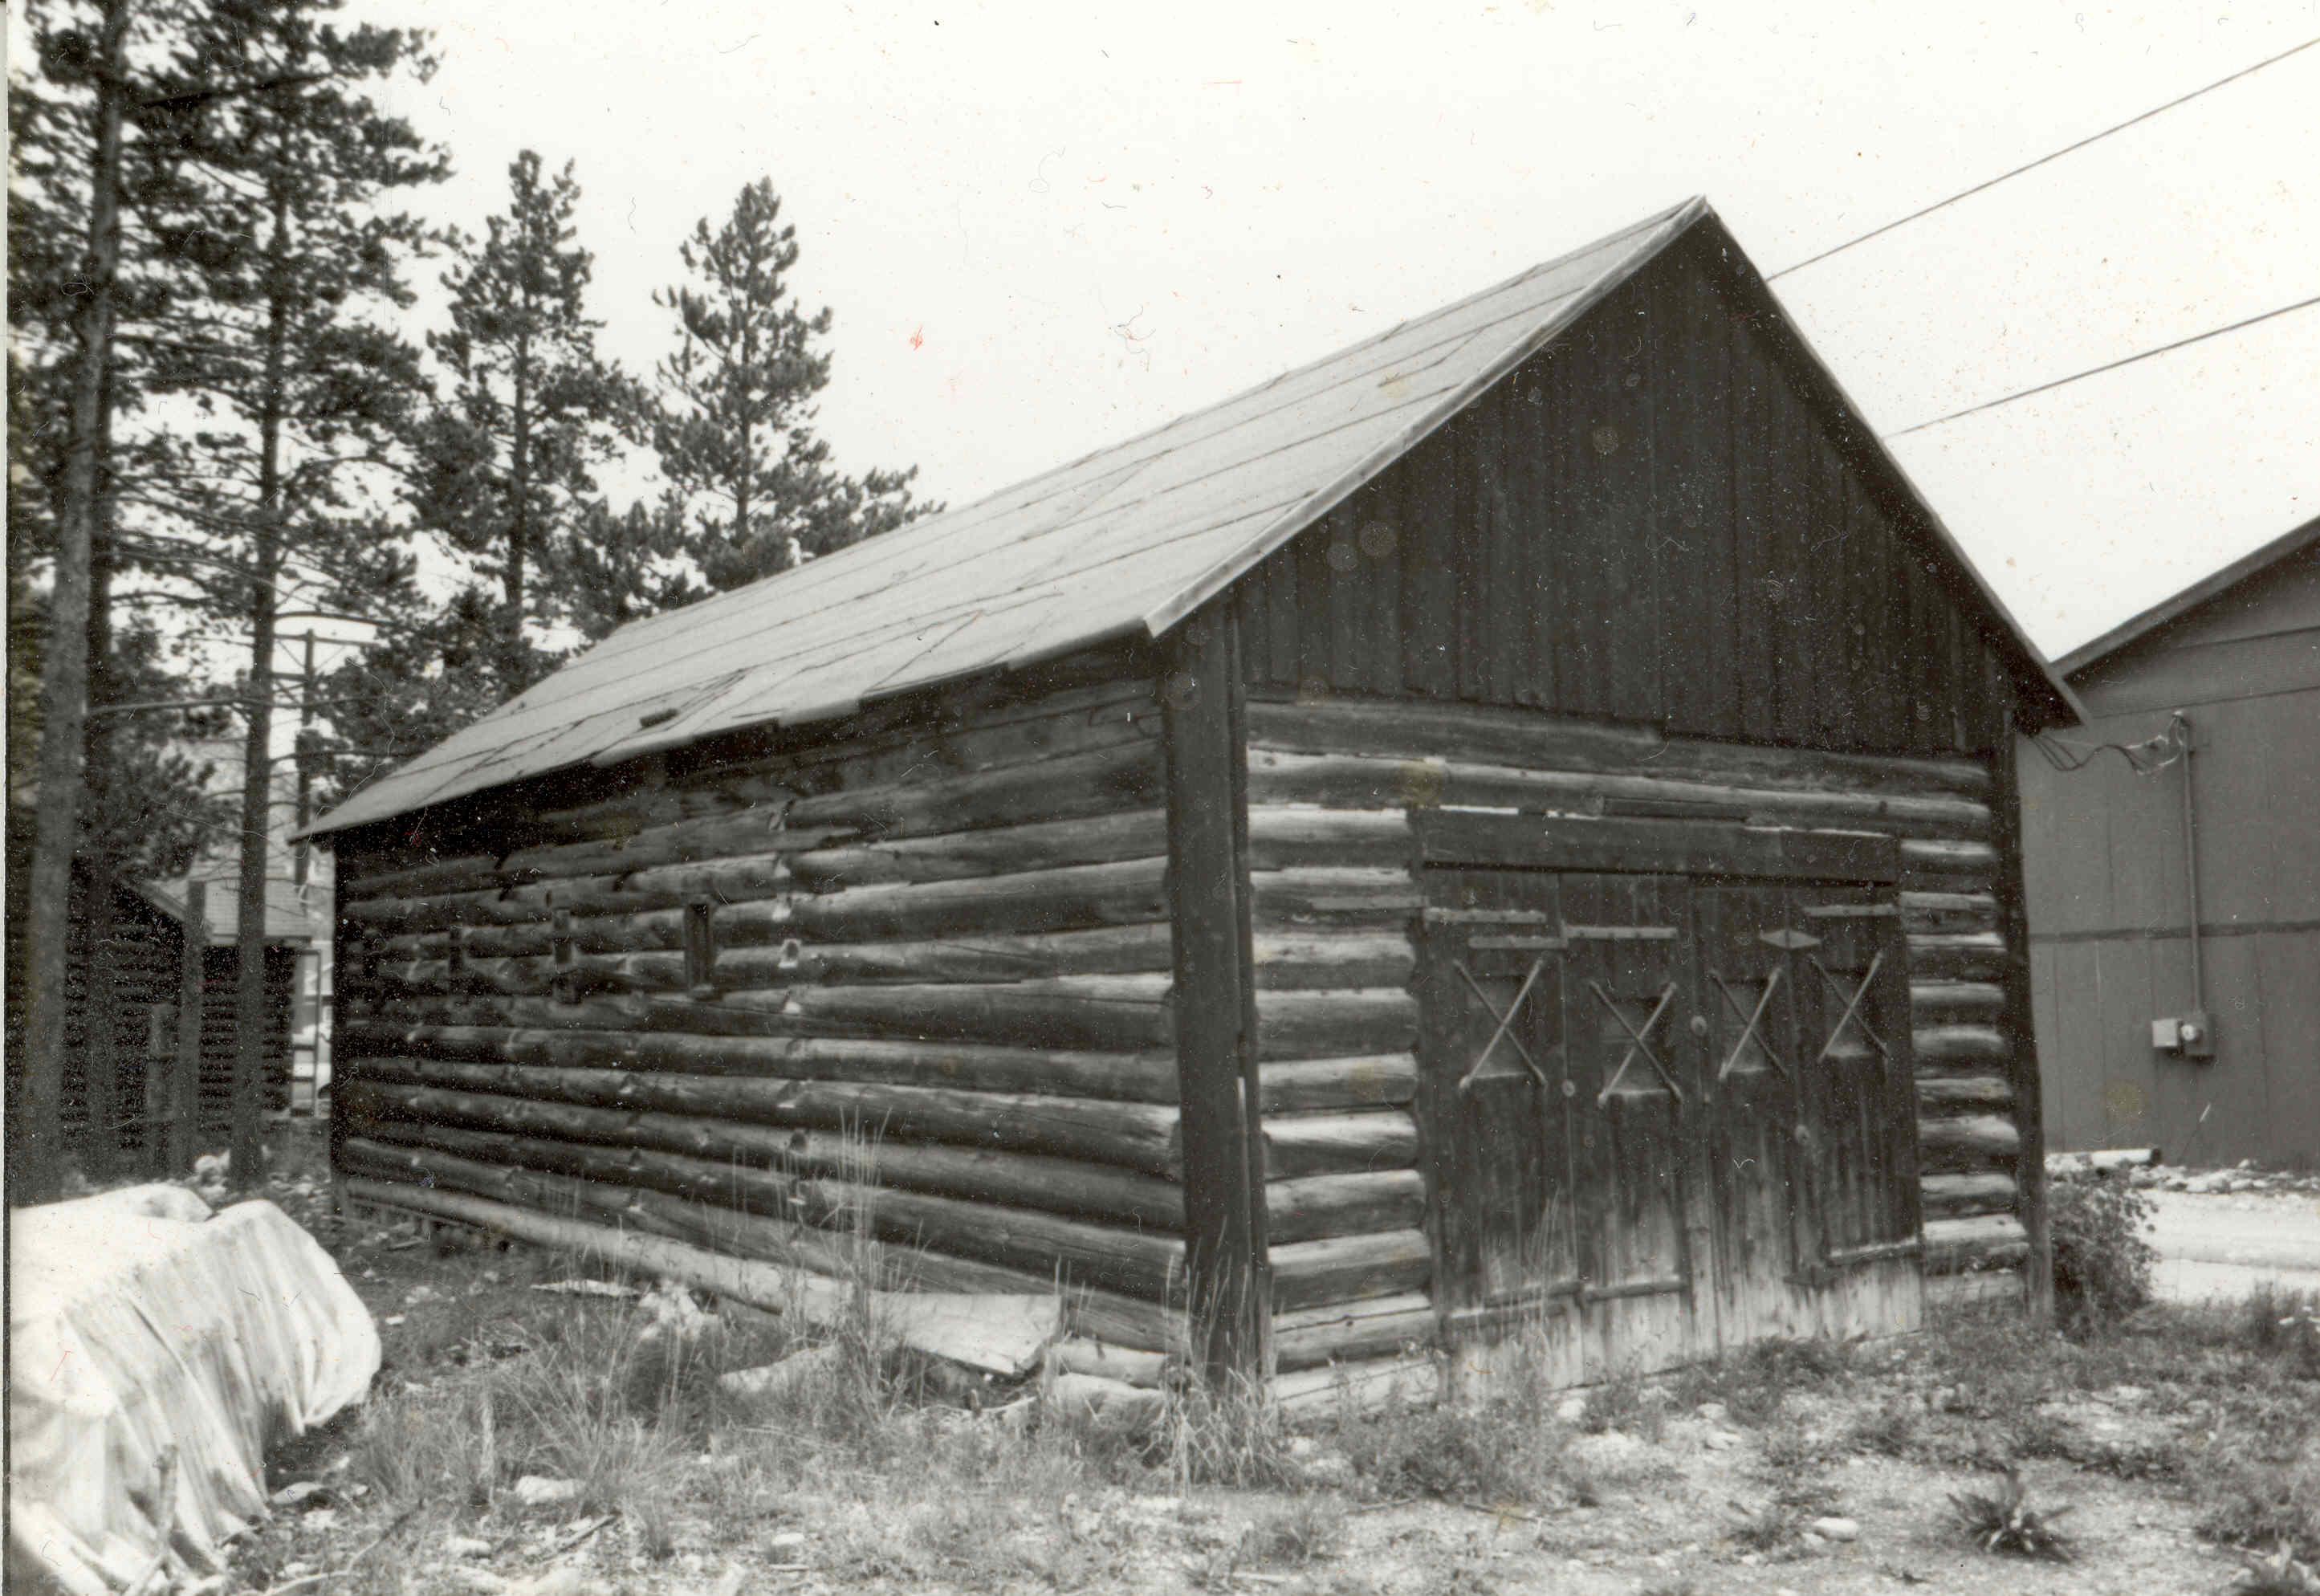 The Jail at its original location. Circa 1983.